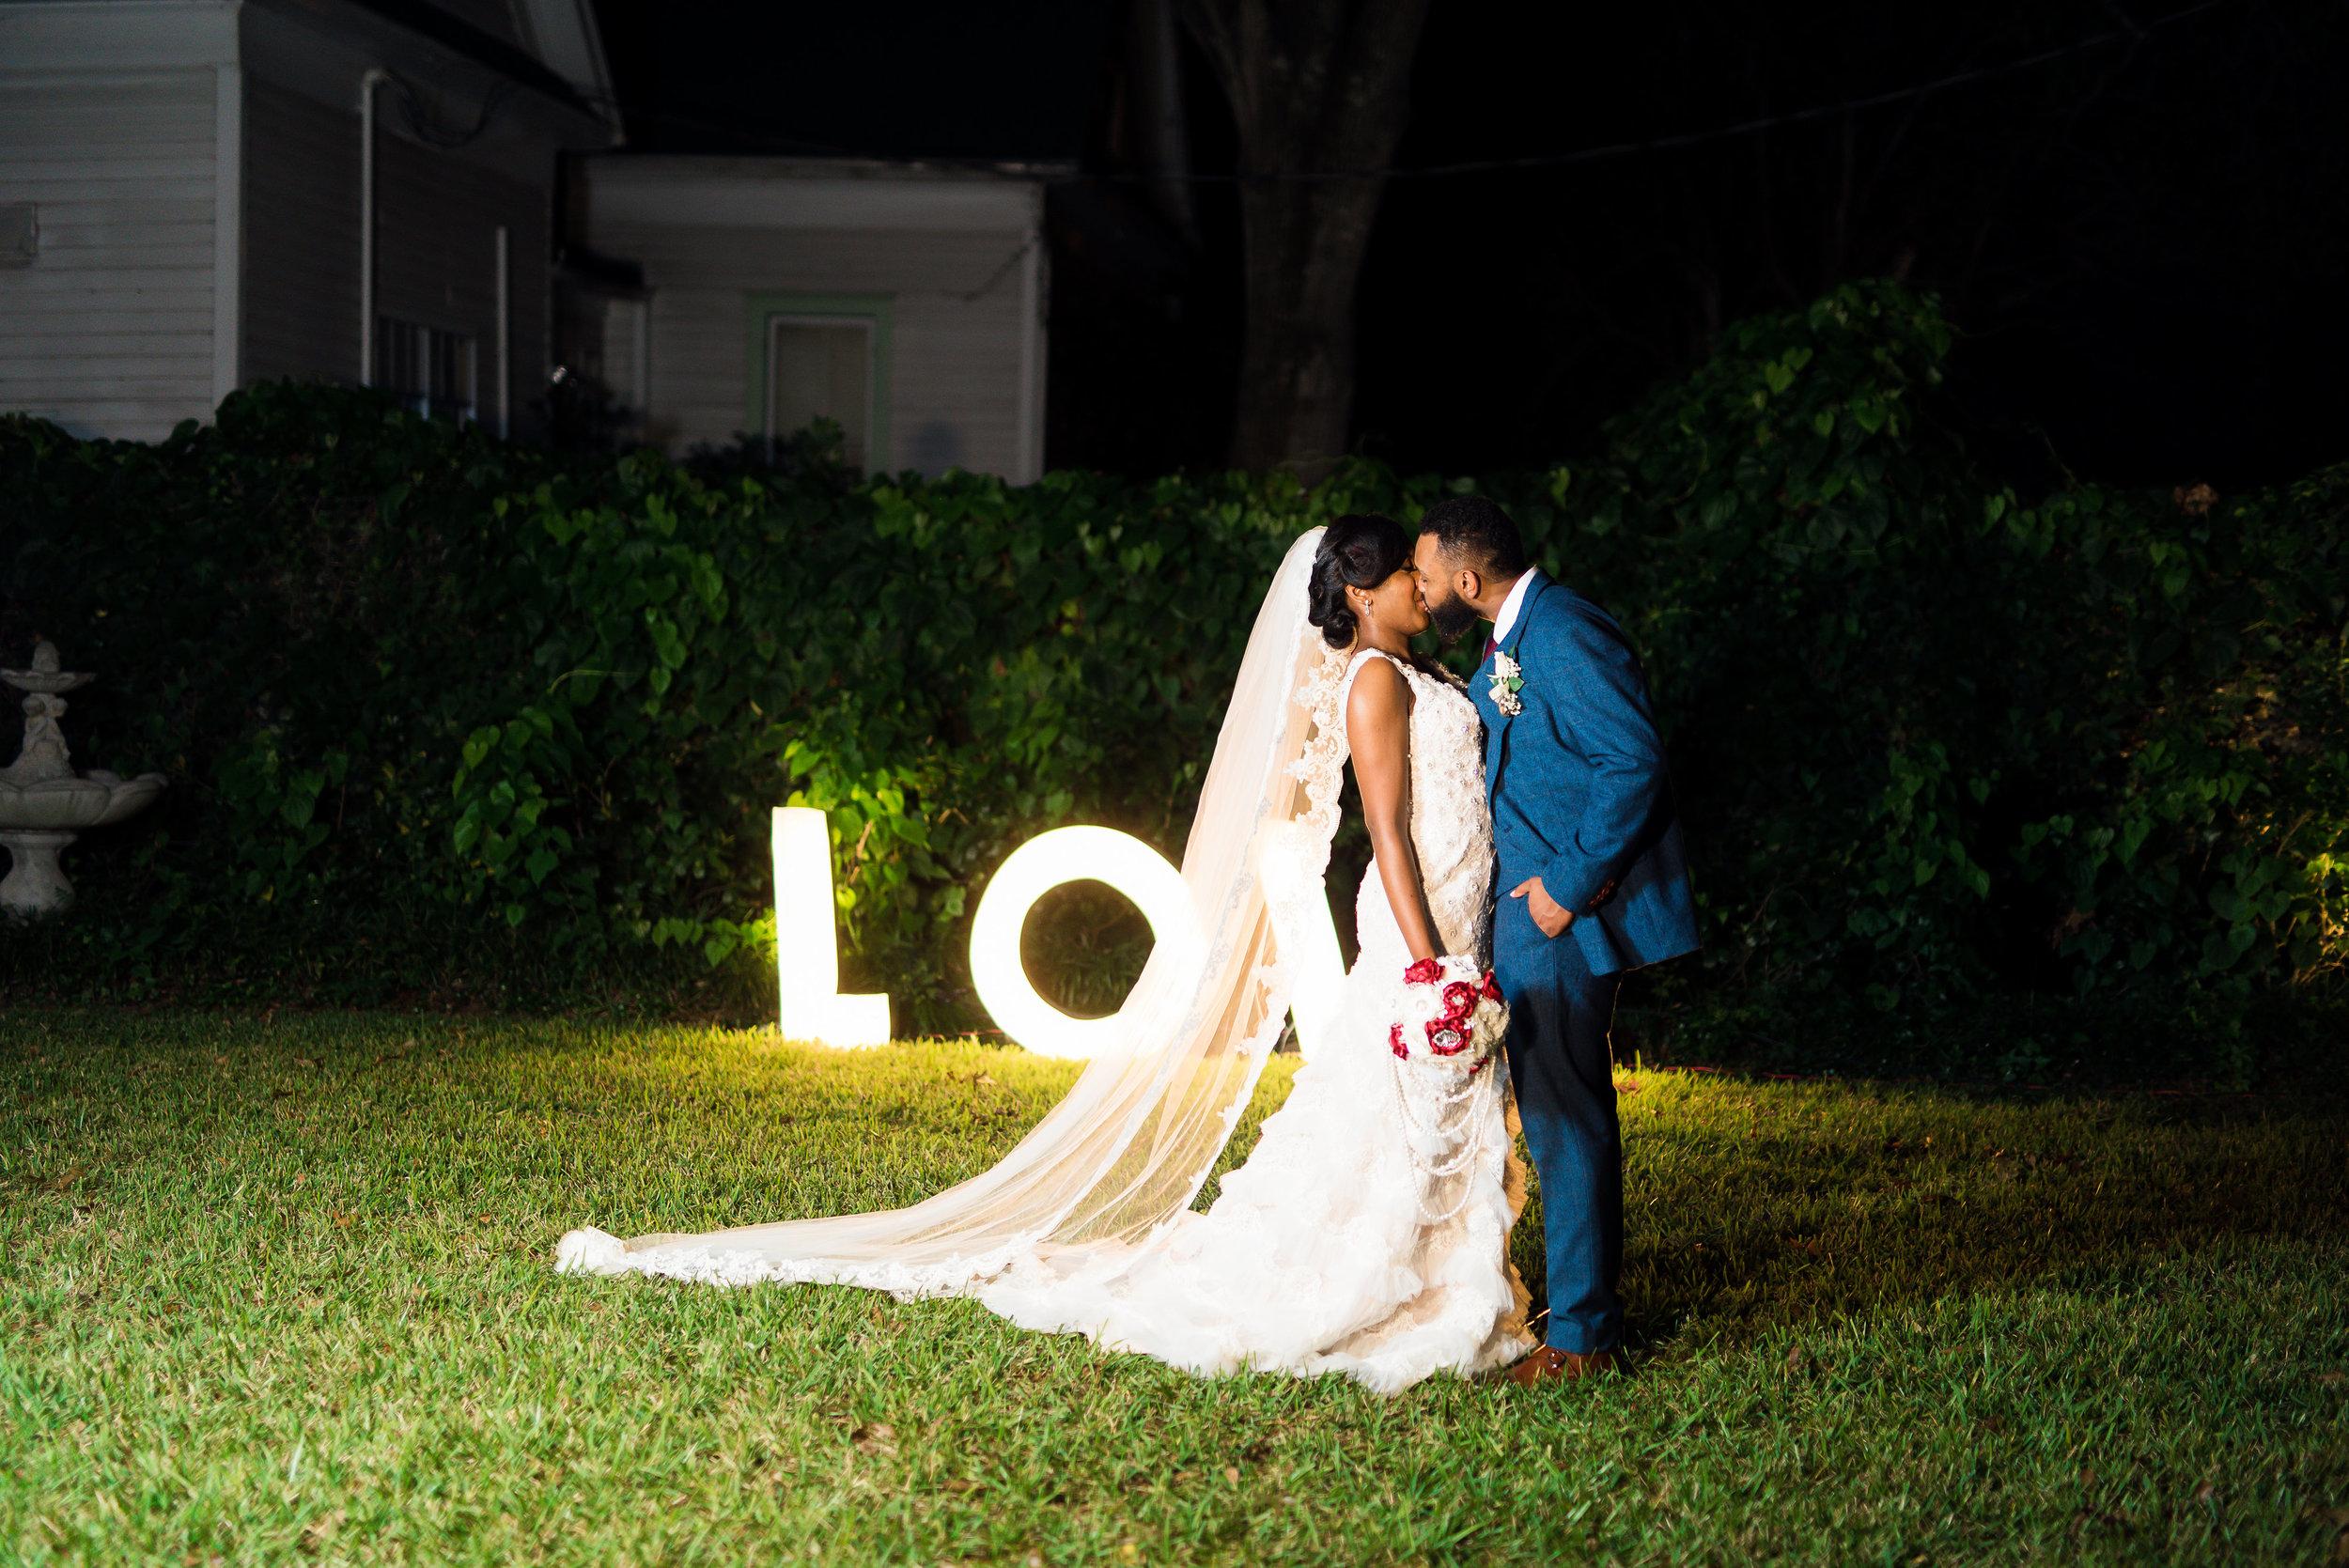 TC-Jessica-Garr-Pharris-Photography-Real-Wedding-34.jpg